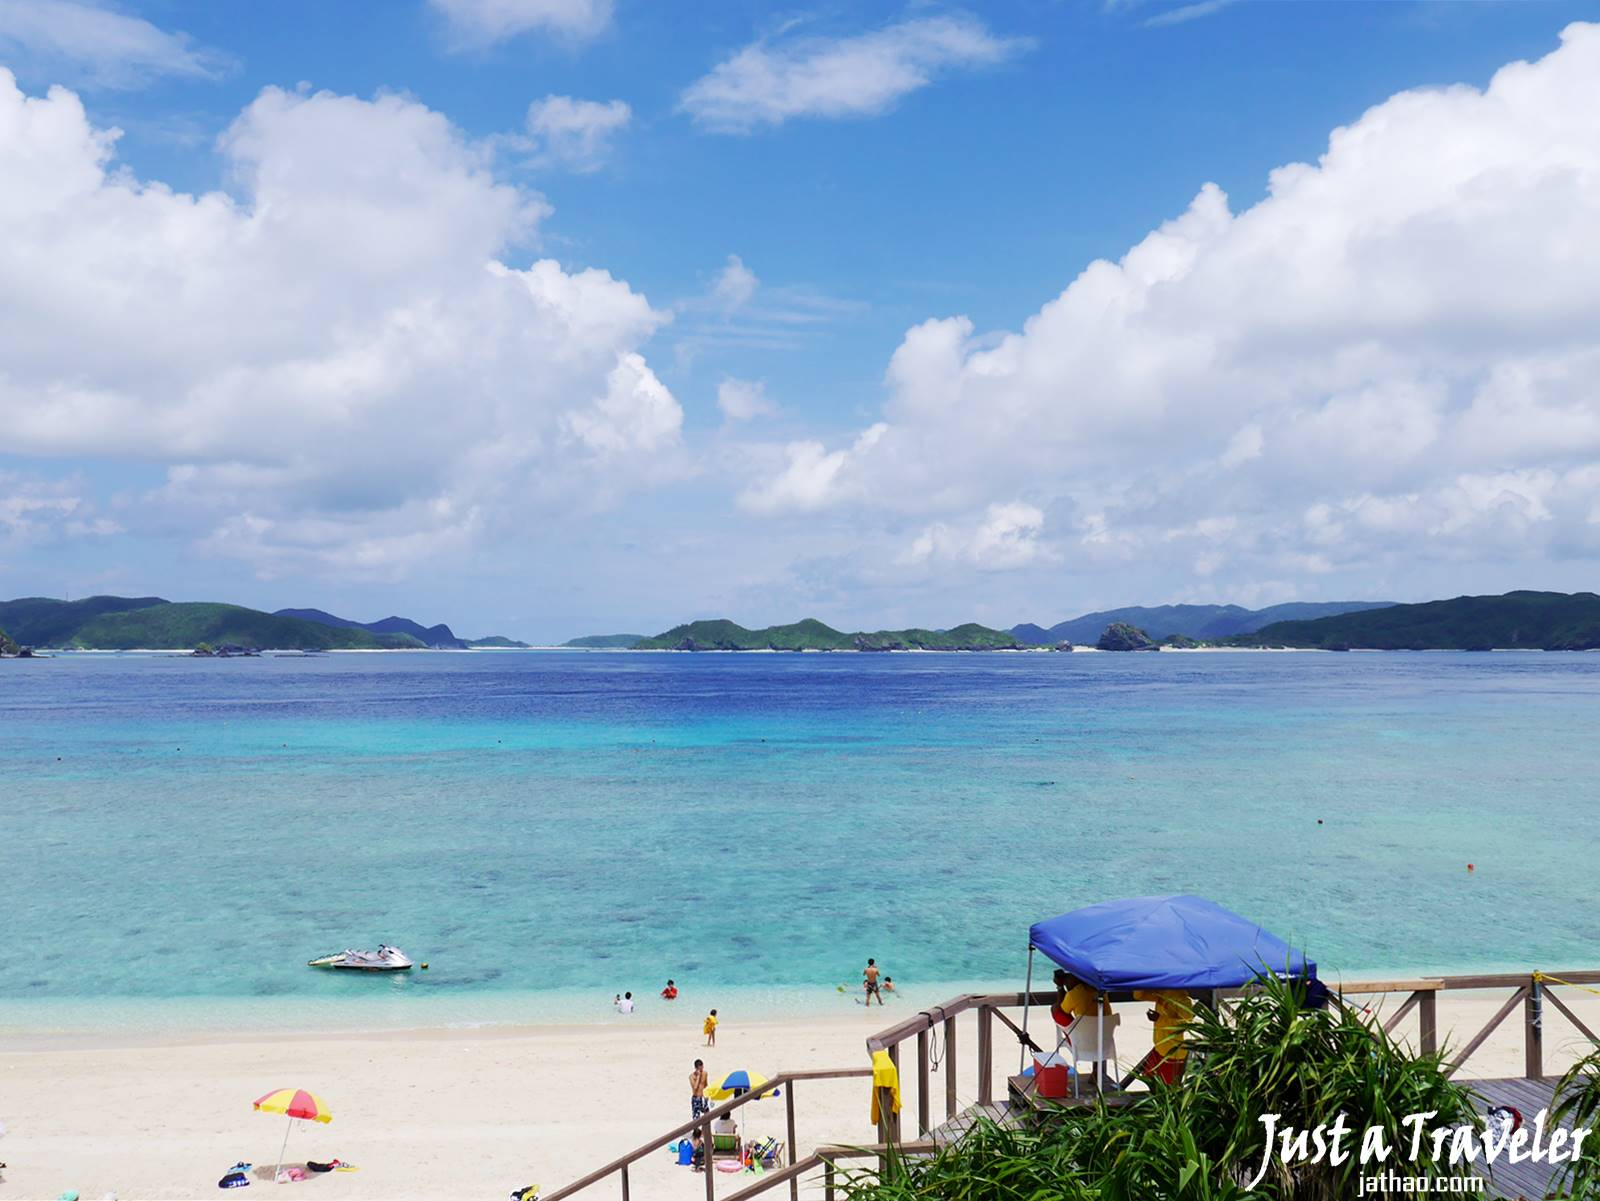 日本-沖繩-推薦-景點-觀光-旅遊-旅行-自由行-北部-中部-南部-離島-海灘-Okinawa-Tourist-Attraction-Travel-Japan